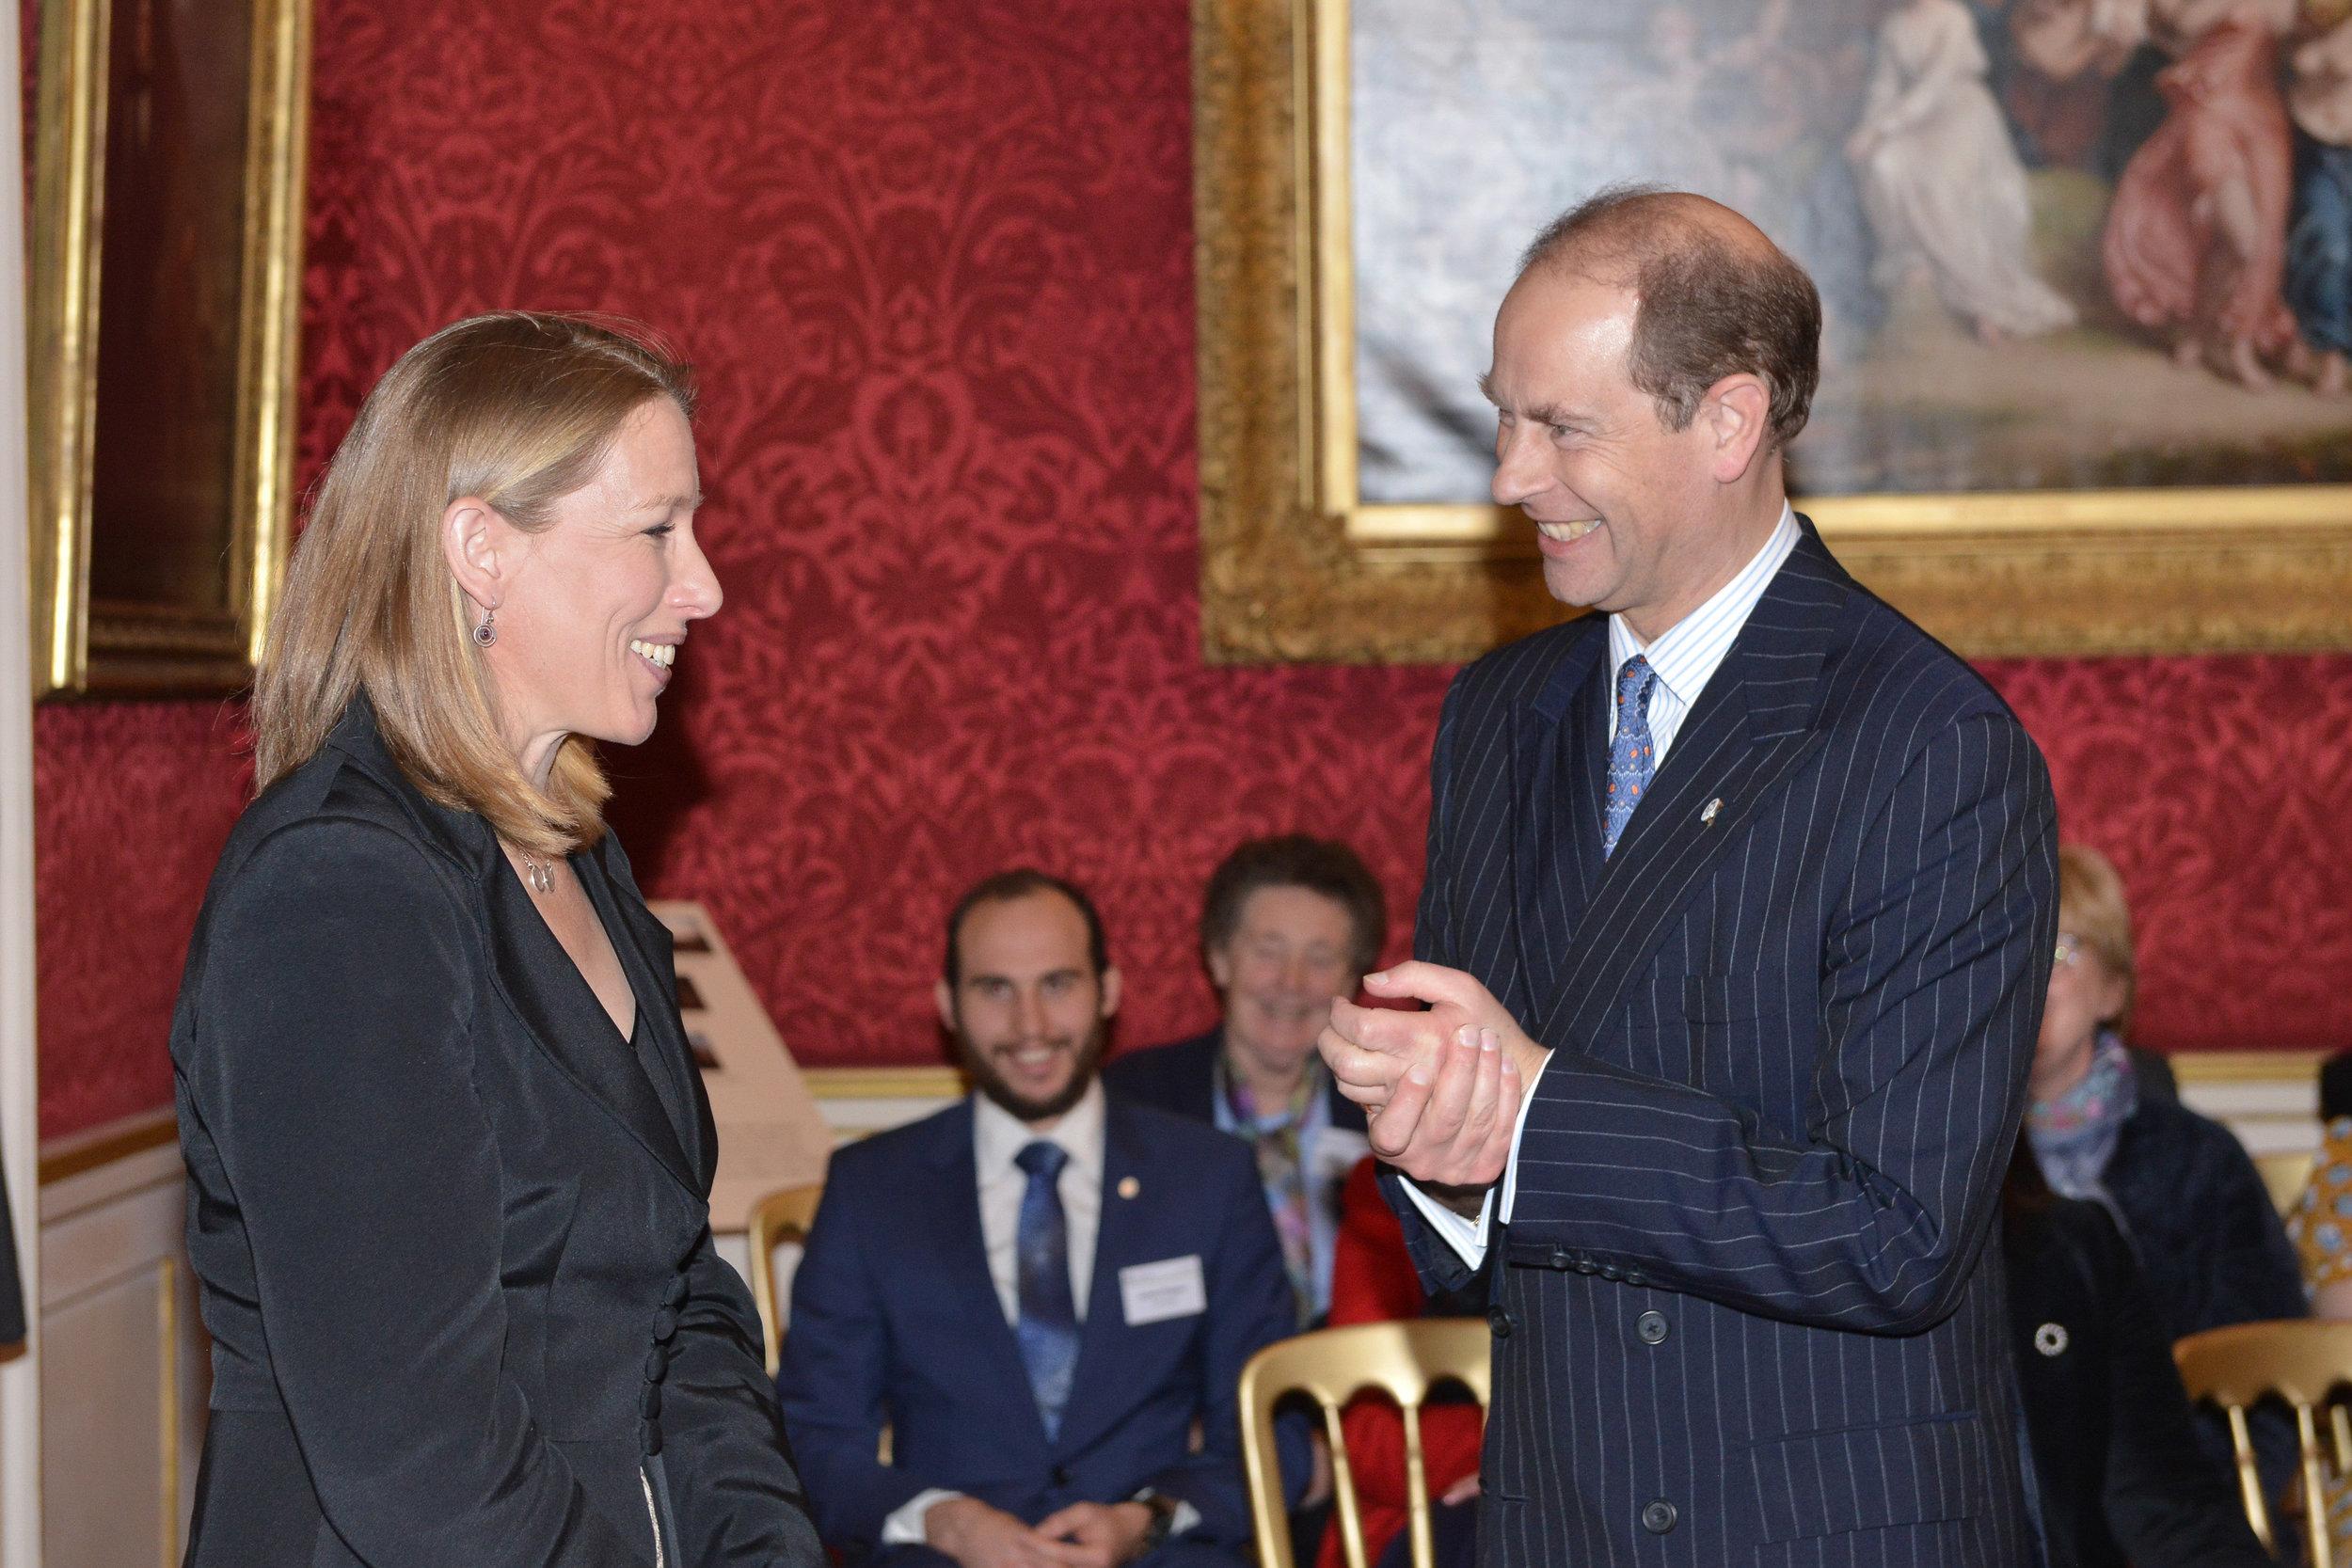 DofE Gold Awards presentation at St. James's Palace. December 2018